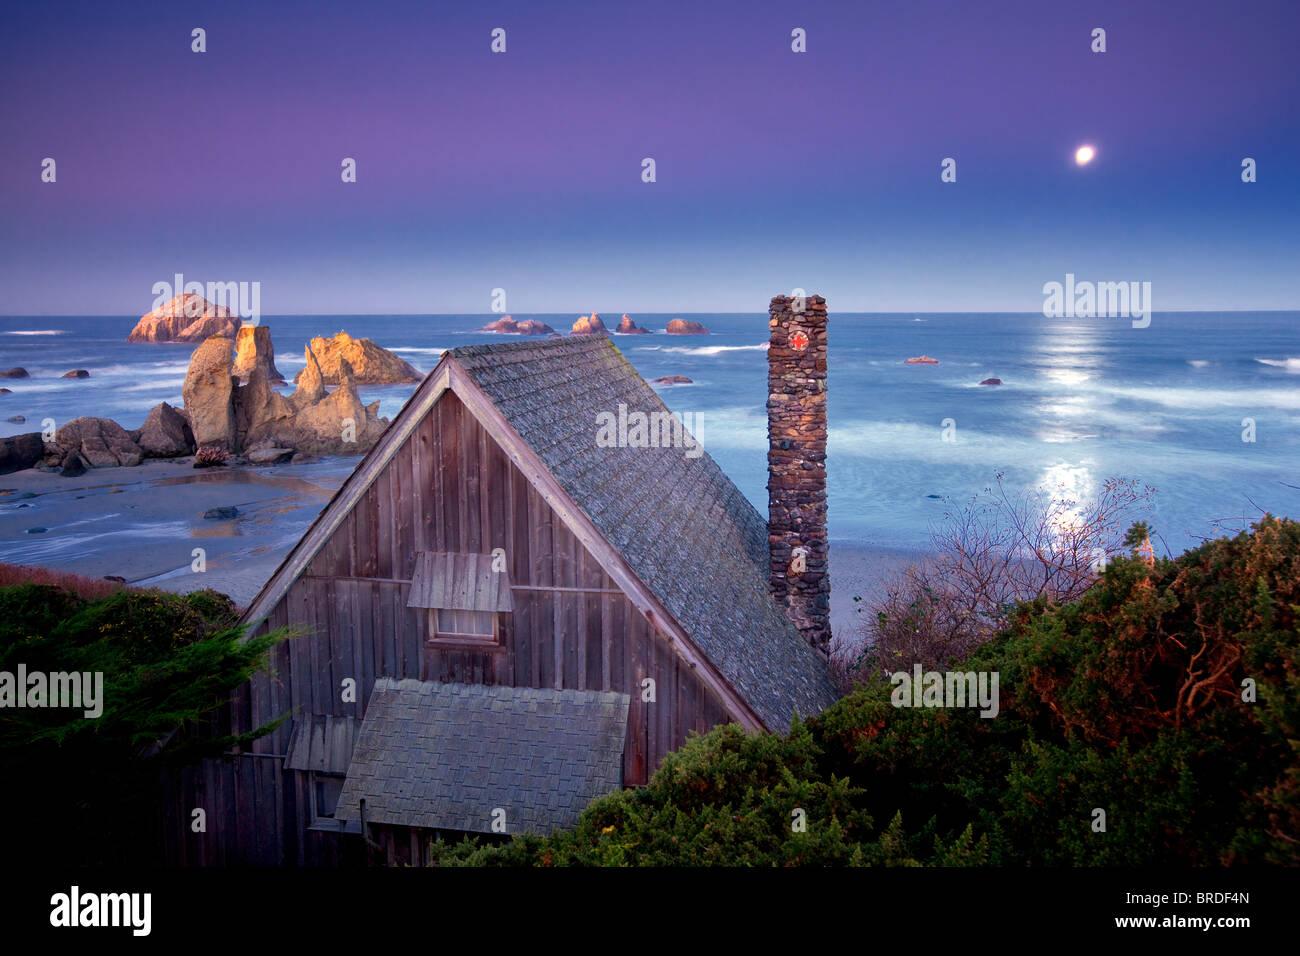 Cabin overlooking Bandon beach with moon set. Bandon, Oregon - Stock Image